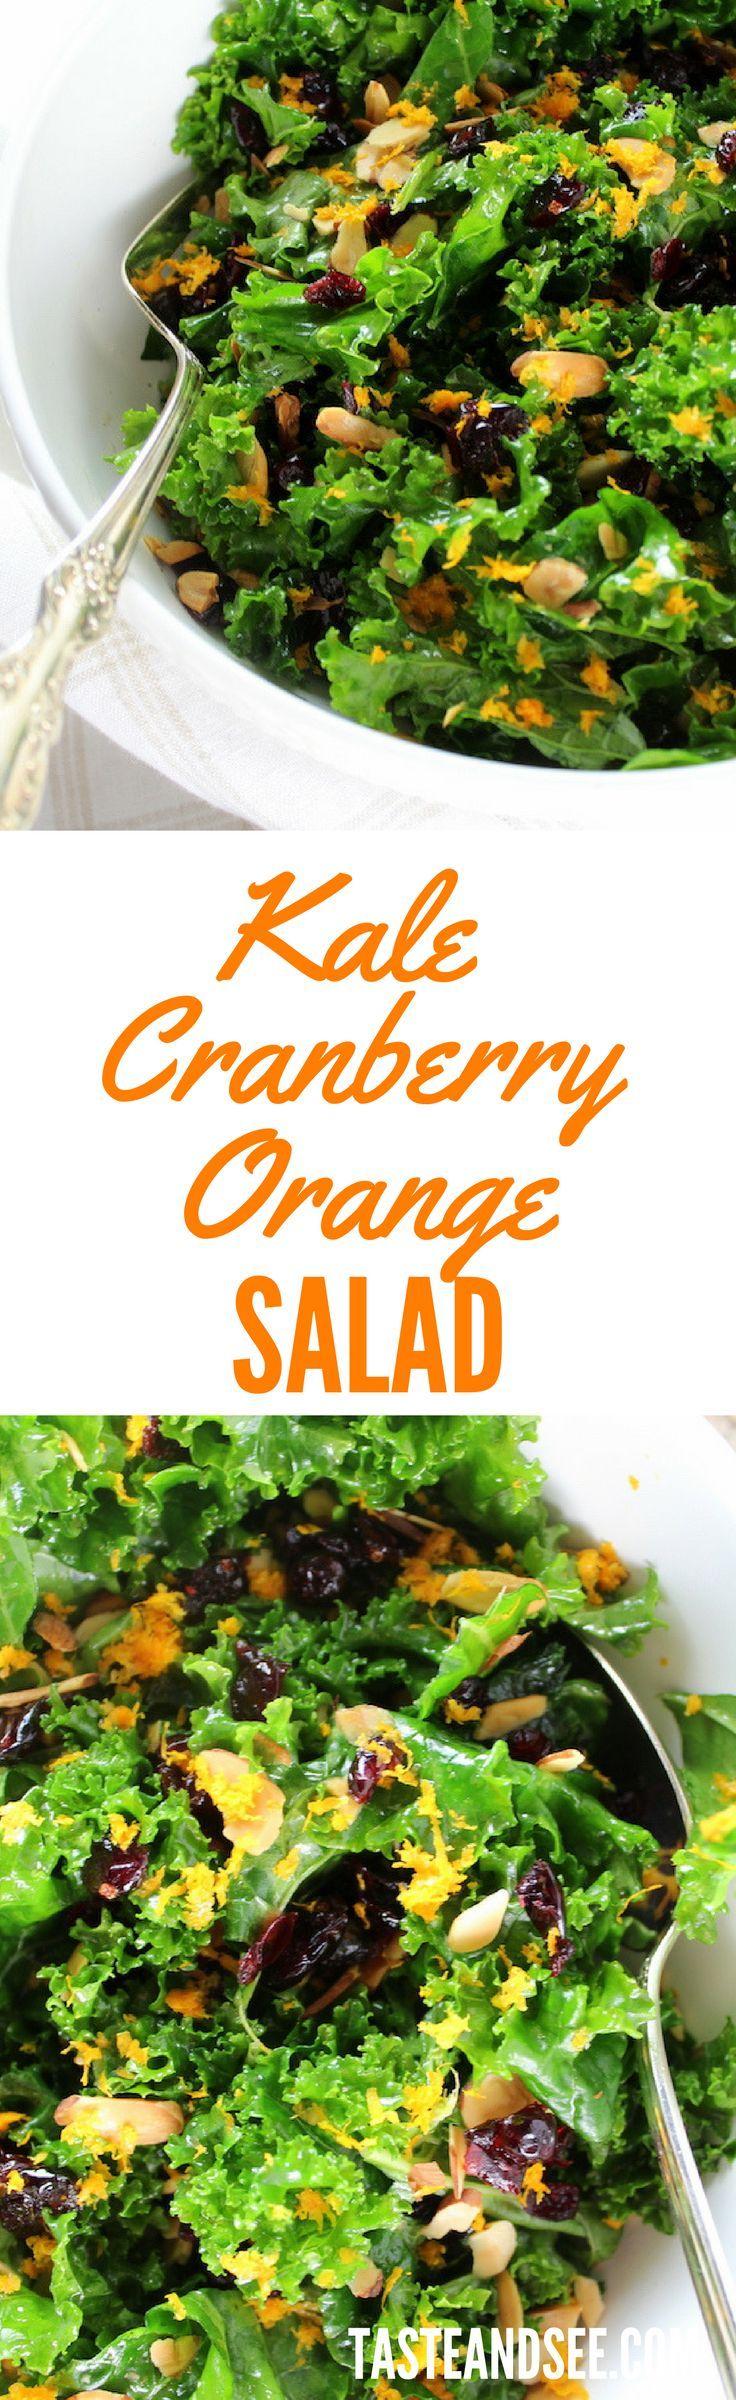 Kale Orange Cranberry Salad - super-quick, healthy, & delicious!  Low-Carb, Low-Cal, Paleo, Gluten-Free, Vegan http://tasteandsee.com